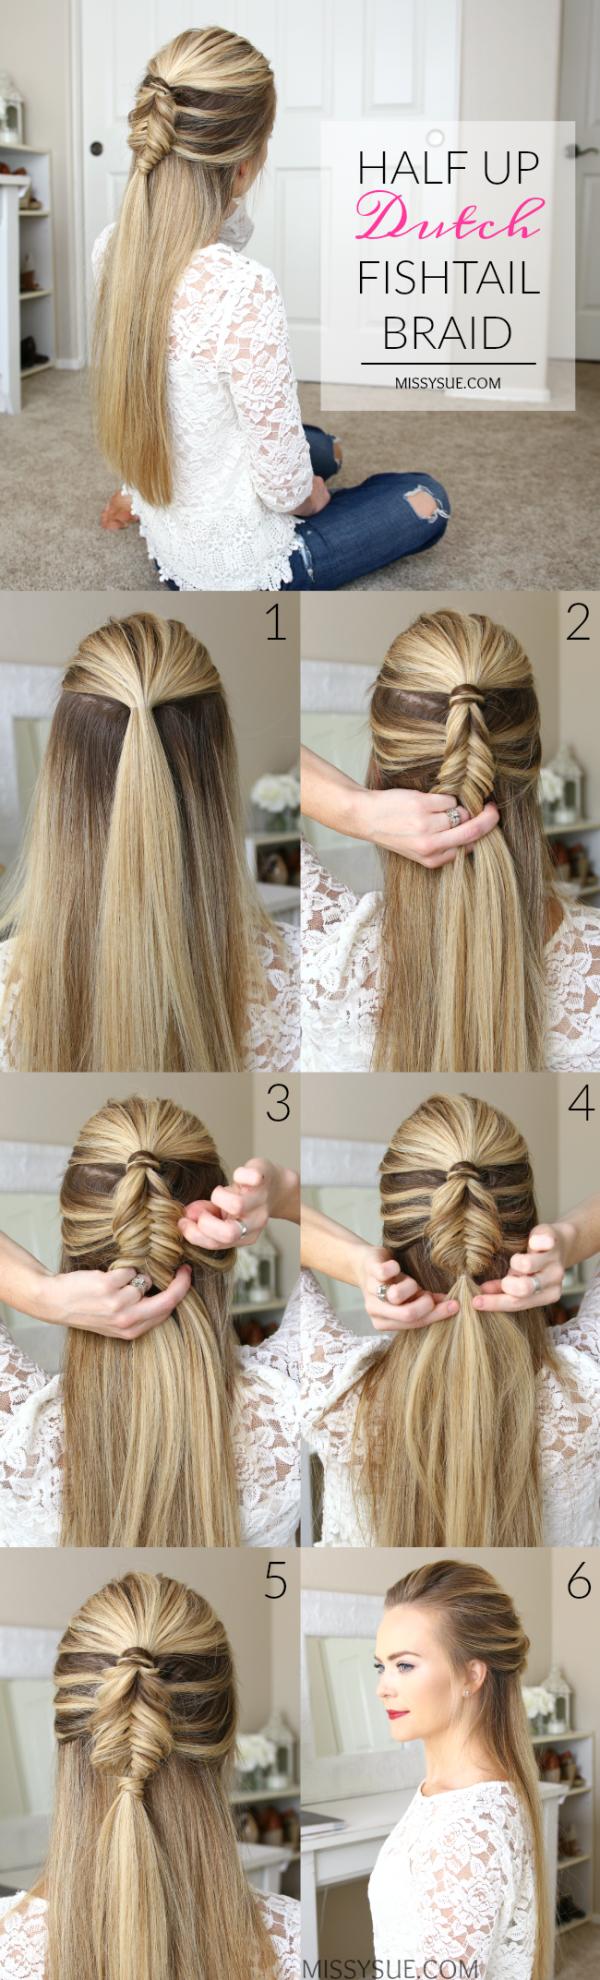 Half Up Mini Dutch Fishtail Braid   MISSY SUE   Hair styles, Fish ...